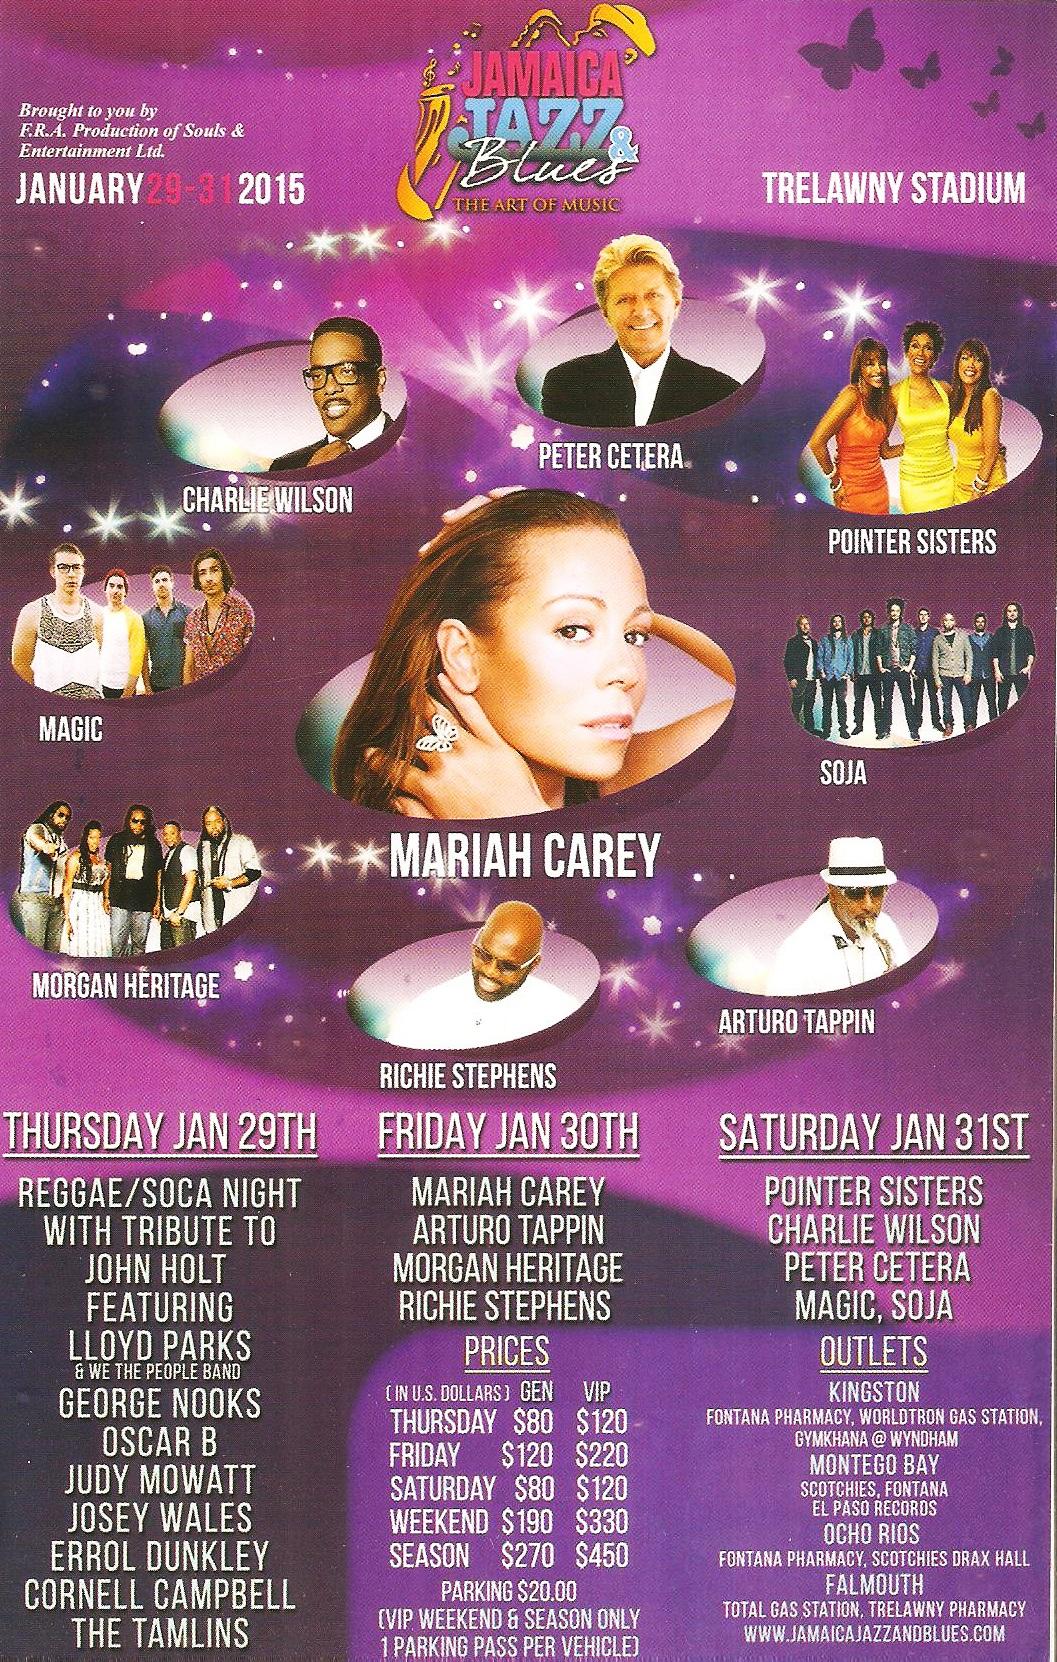 Jazz Festival Jamaica マライア・キャリー ジャマイカ